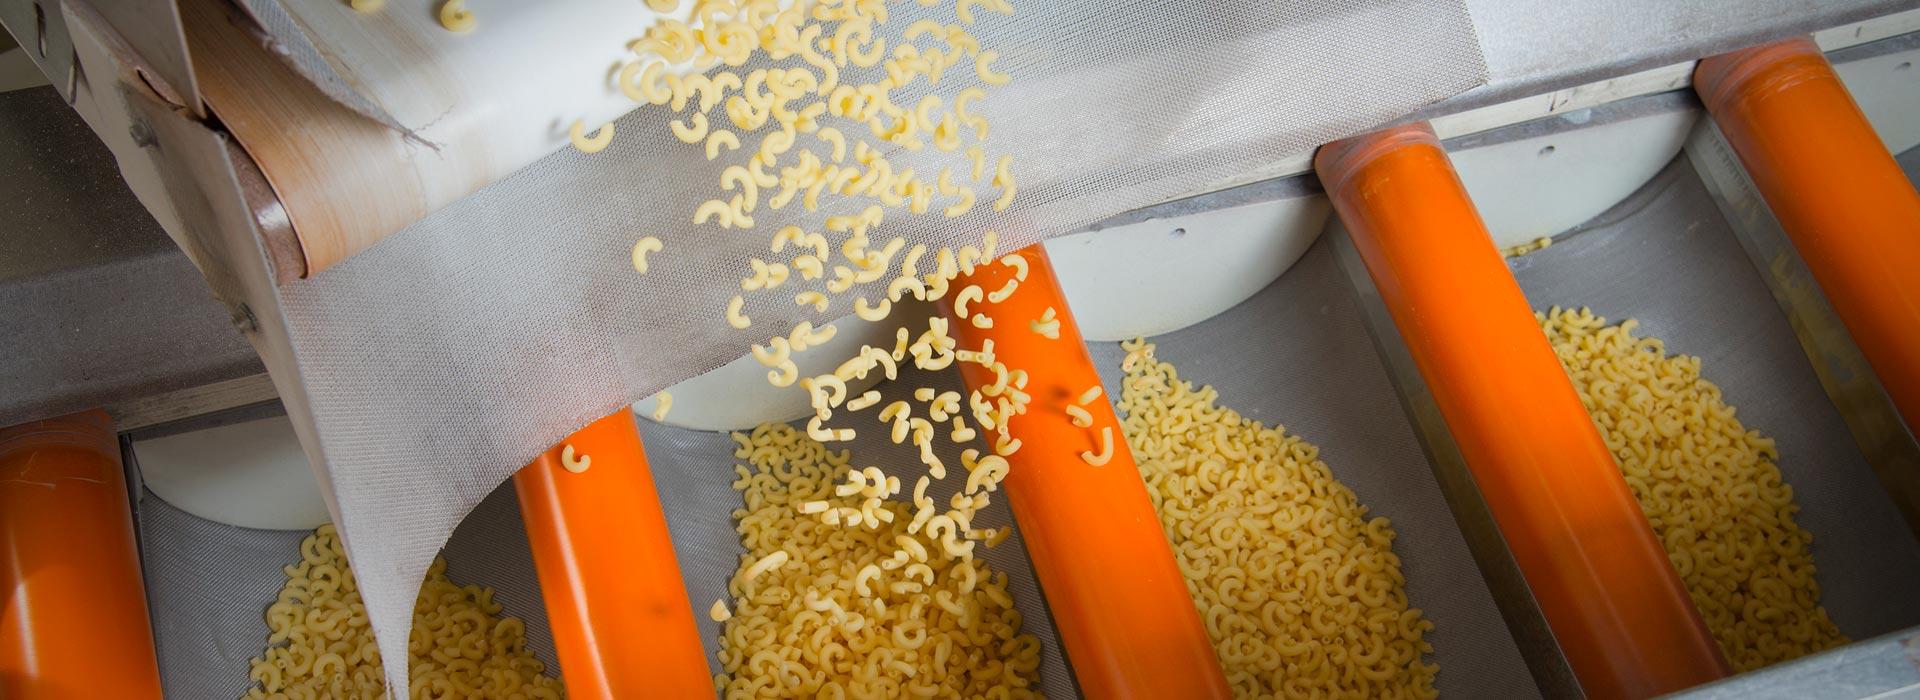 Equipement industrie agroalimentaire Cloisons du Midi